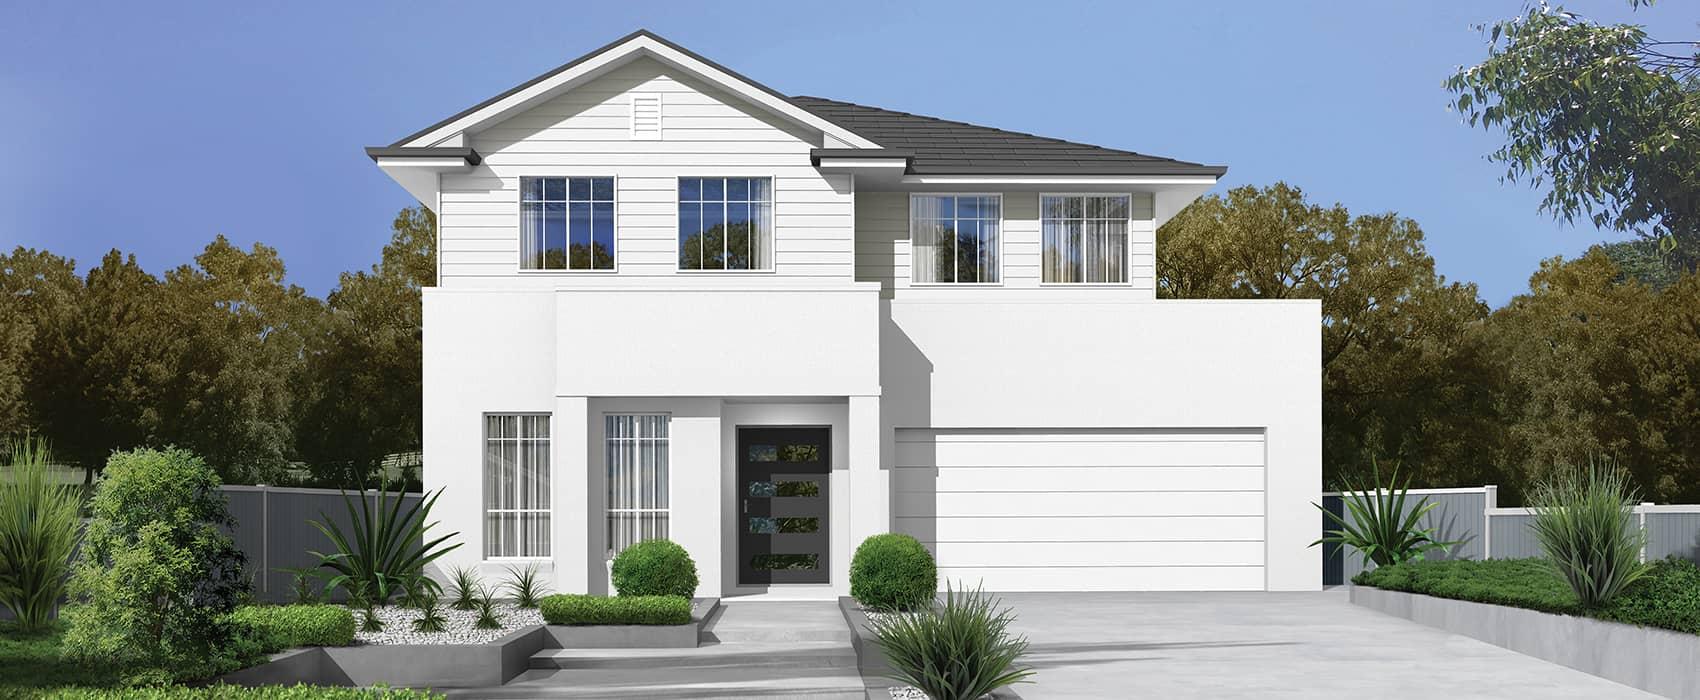 New Haven Home Design